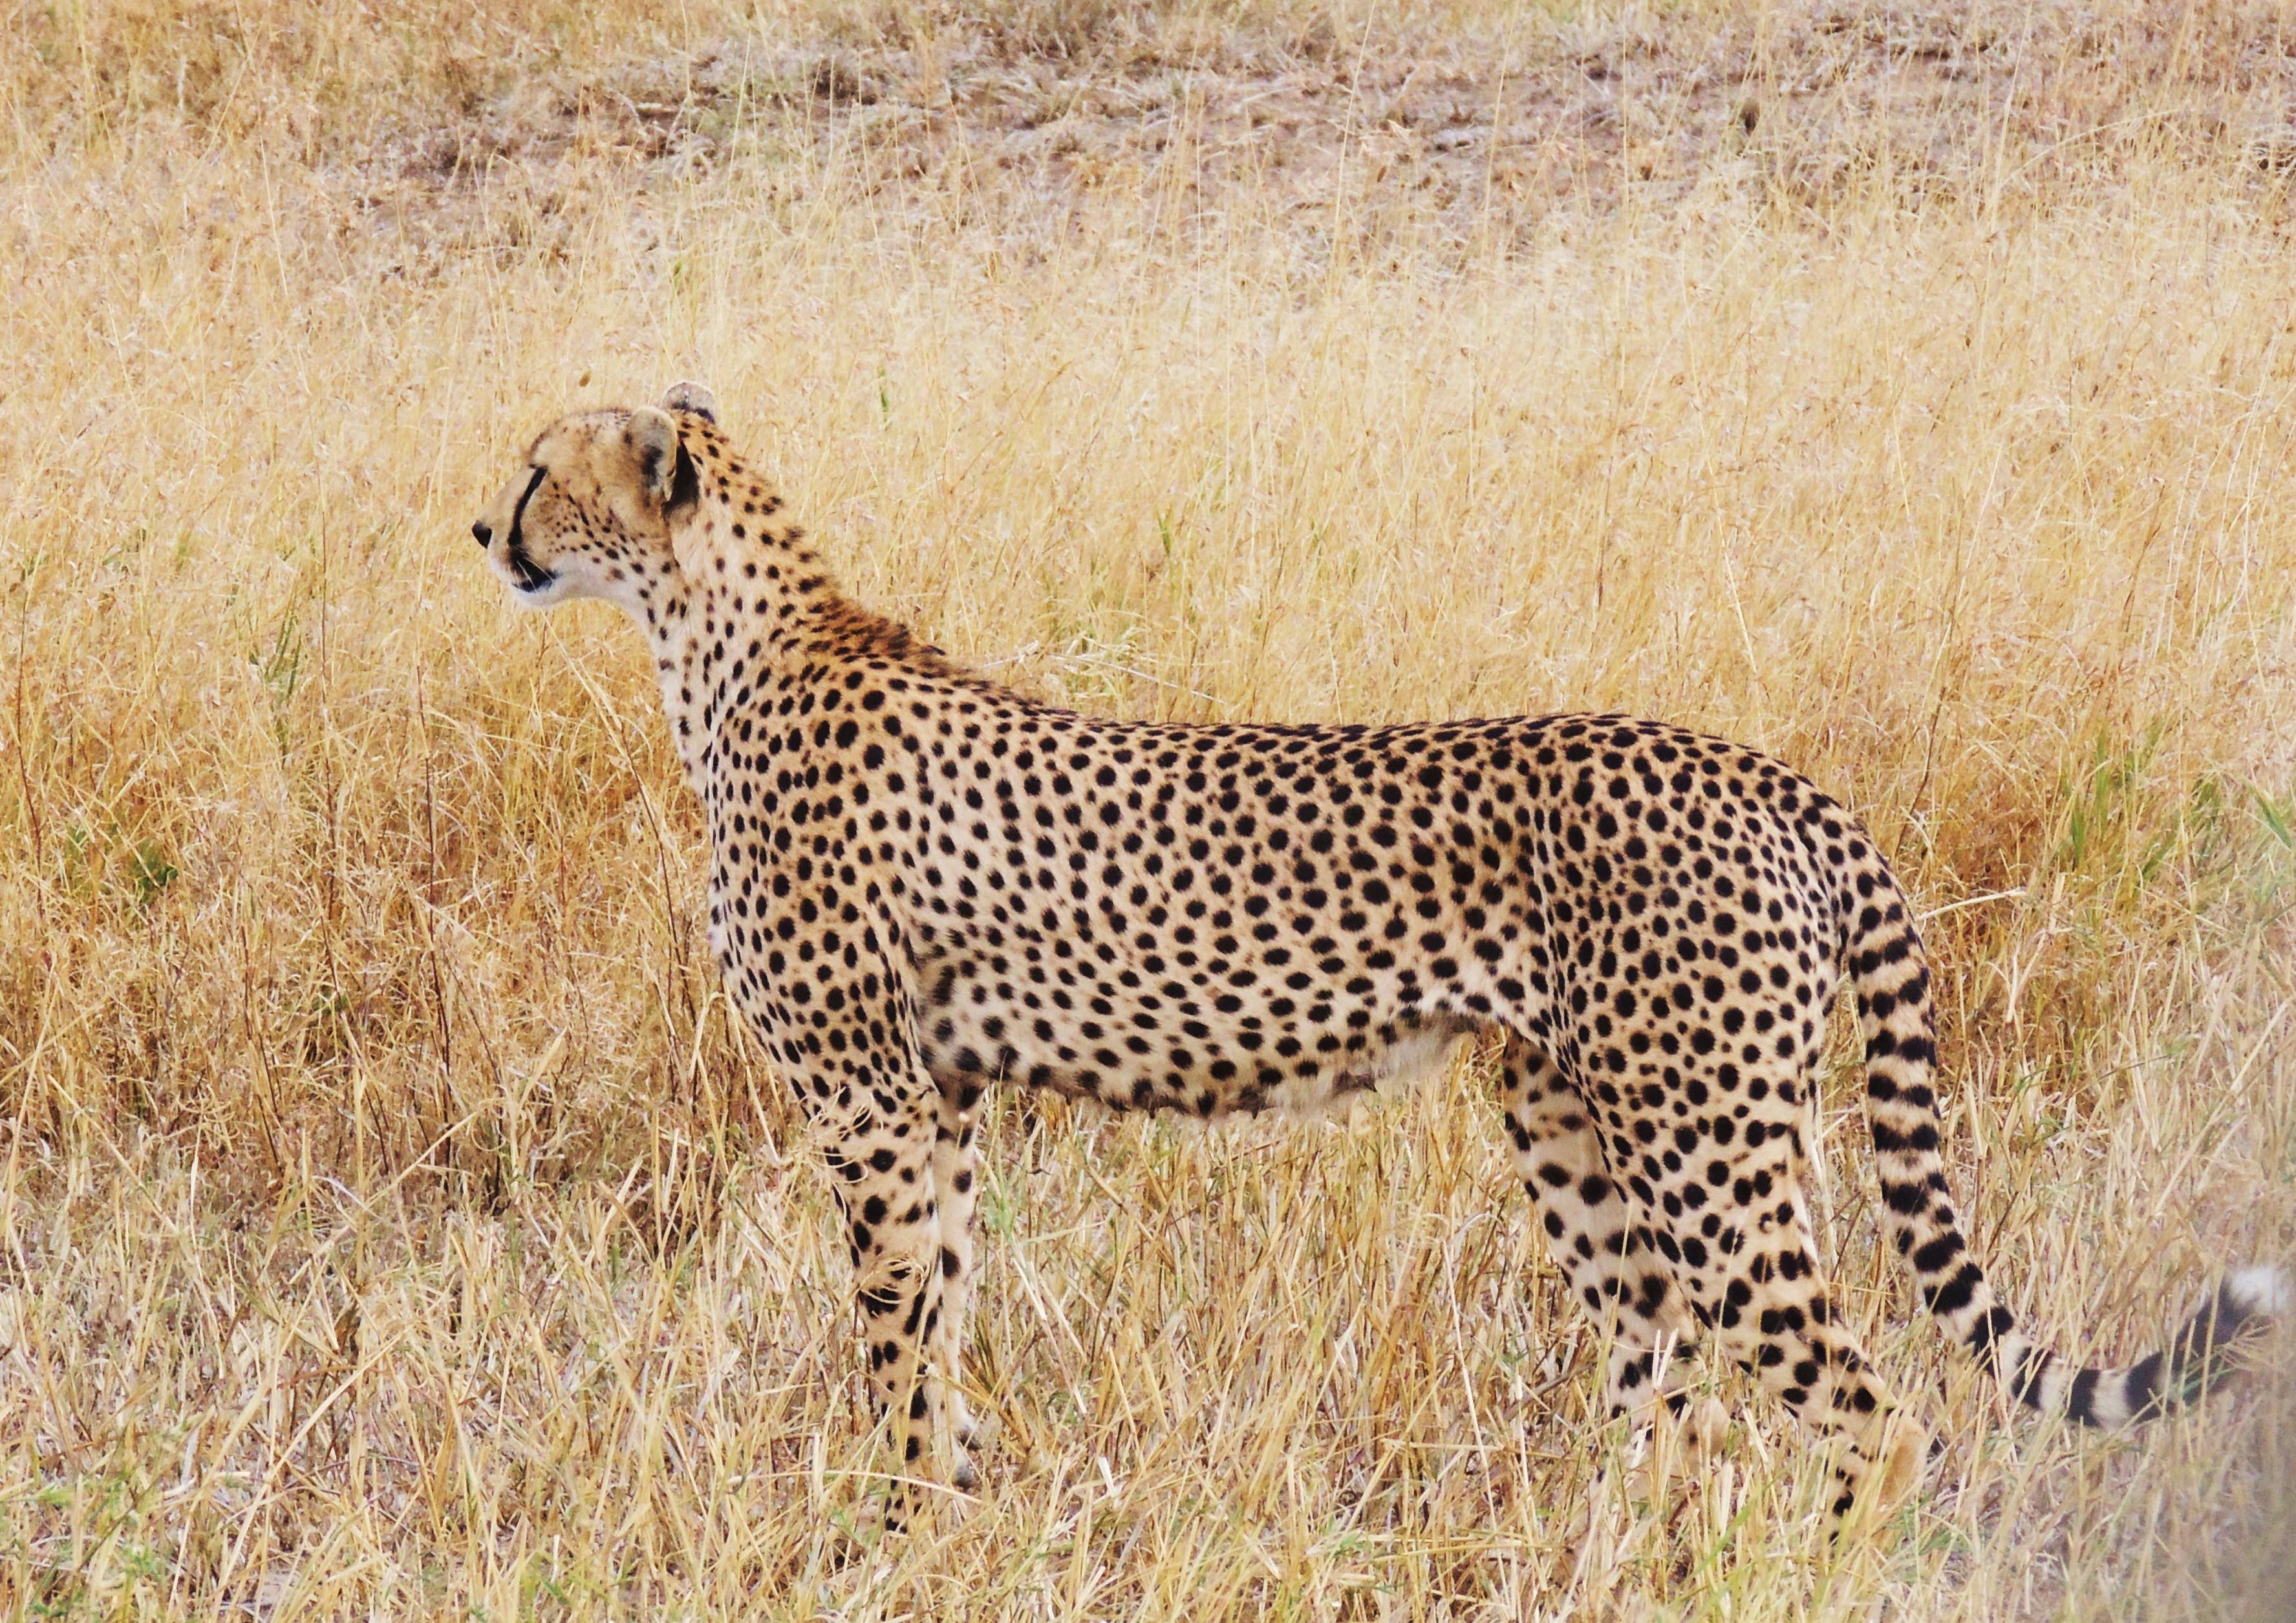 Hyena Cat Or Dog